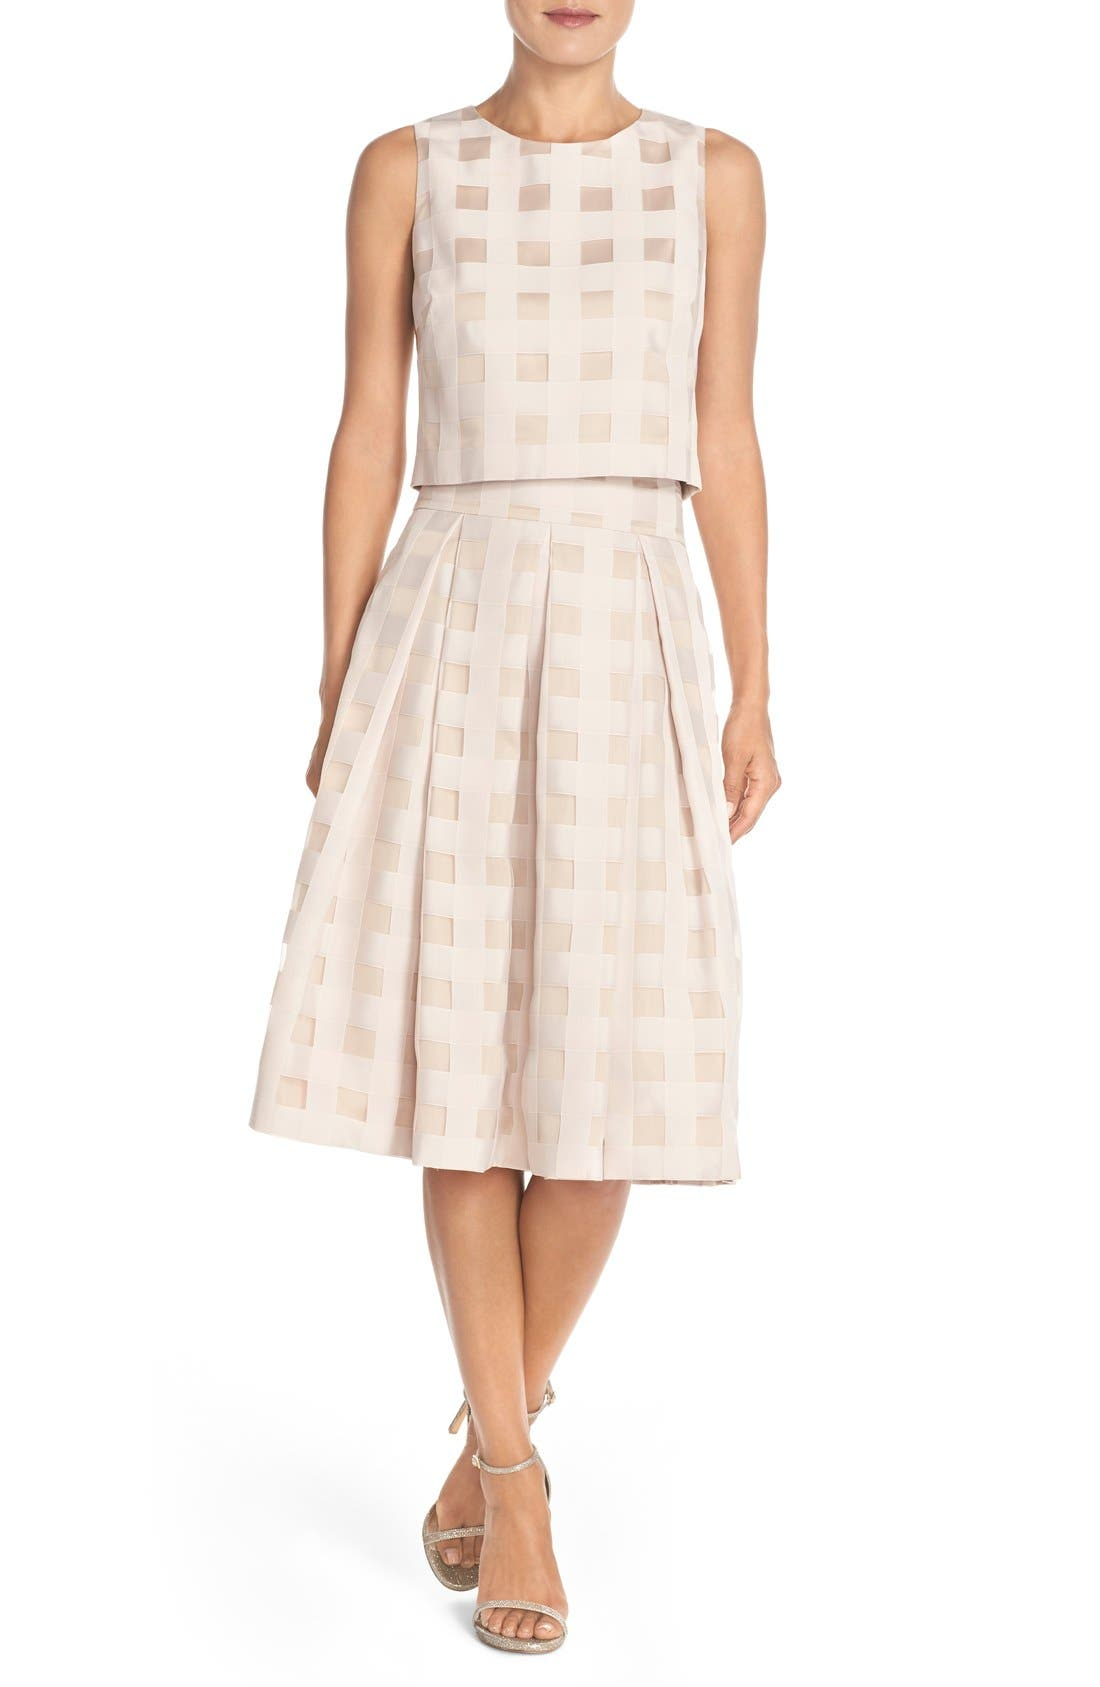 Alternate Image 1 Selected - Eliza J Check Satin Two-Piece Dress